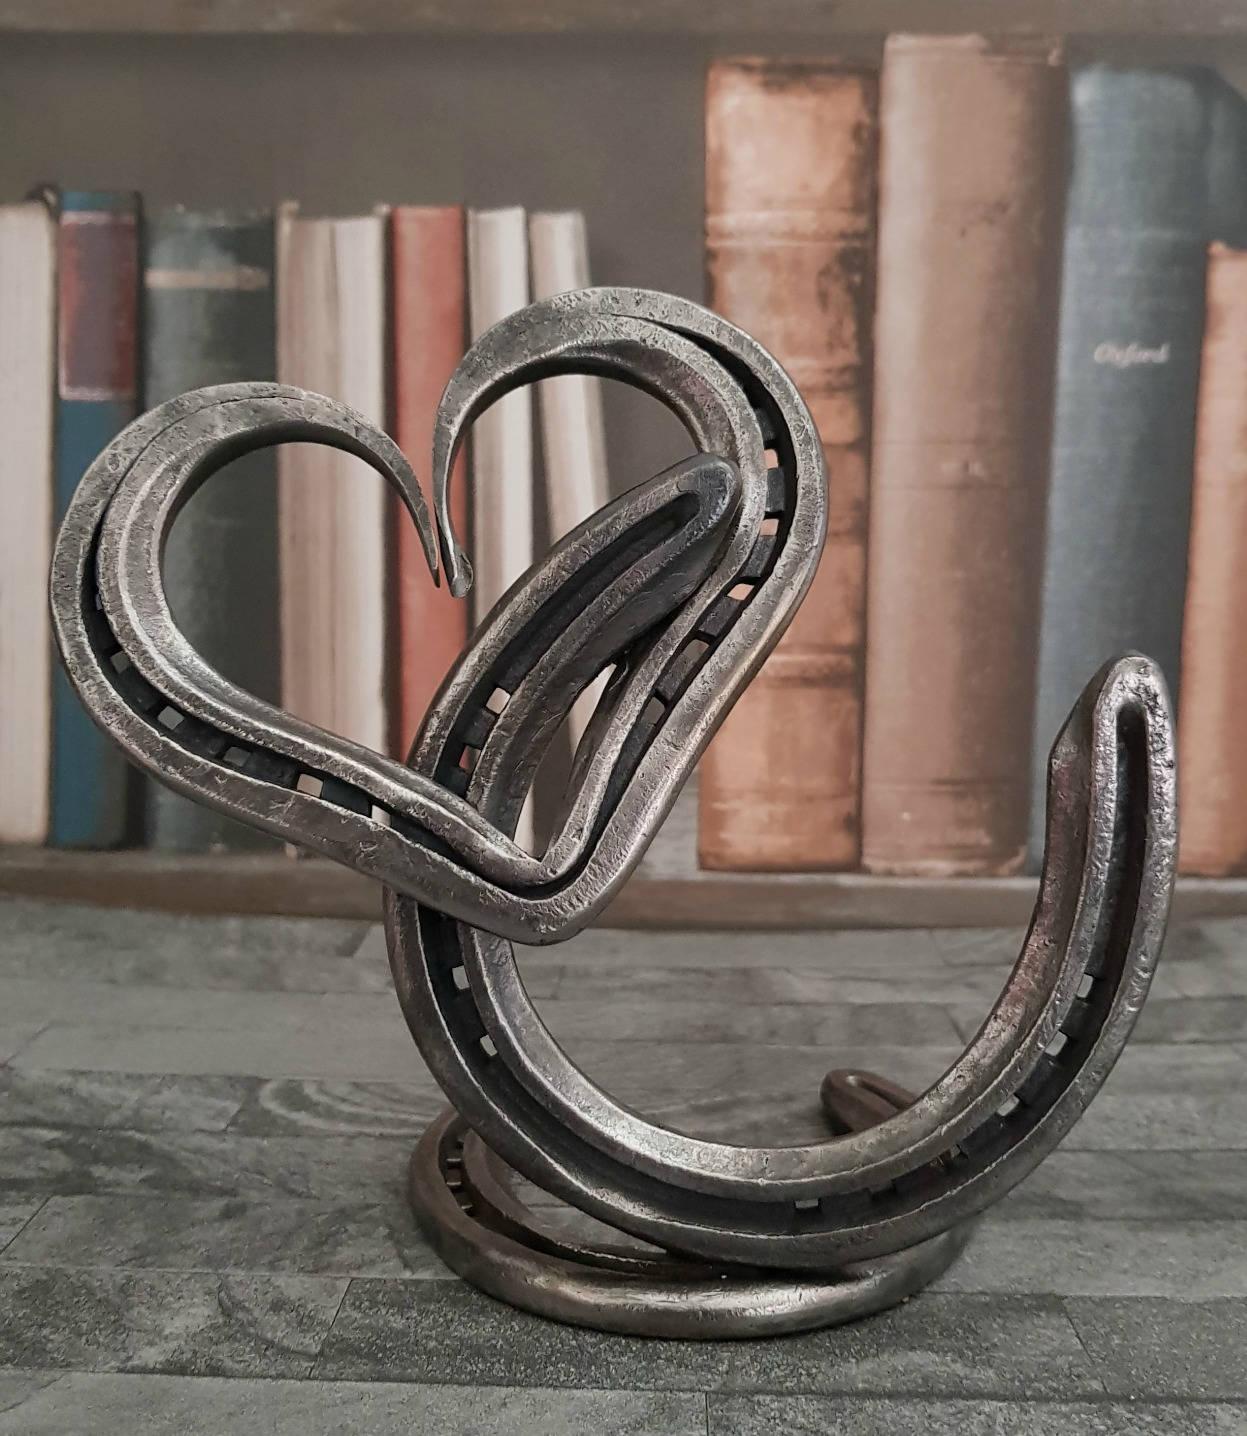 Liebe & Glück Hufeisen Herzen Charme Trophy Skulptur | Etsy